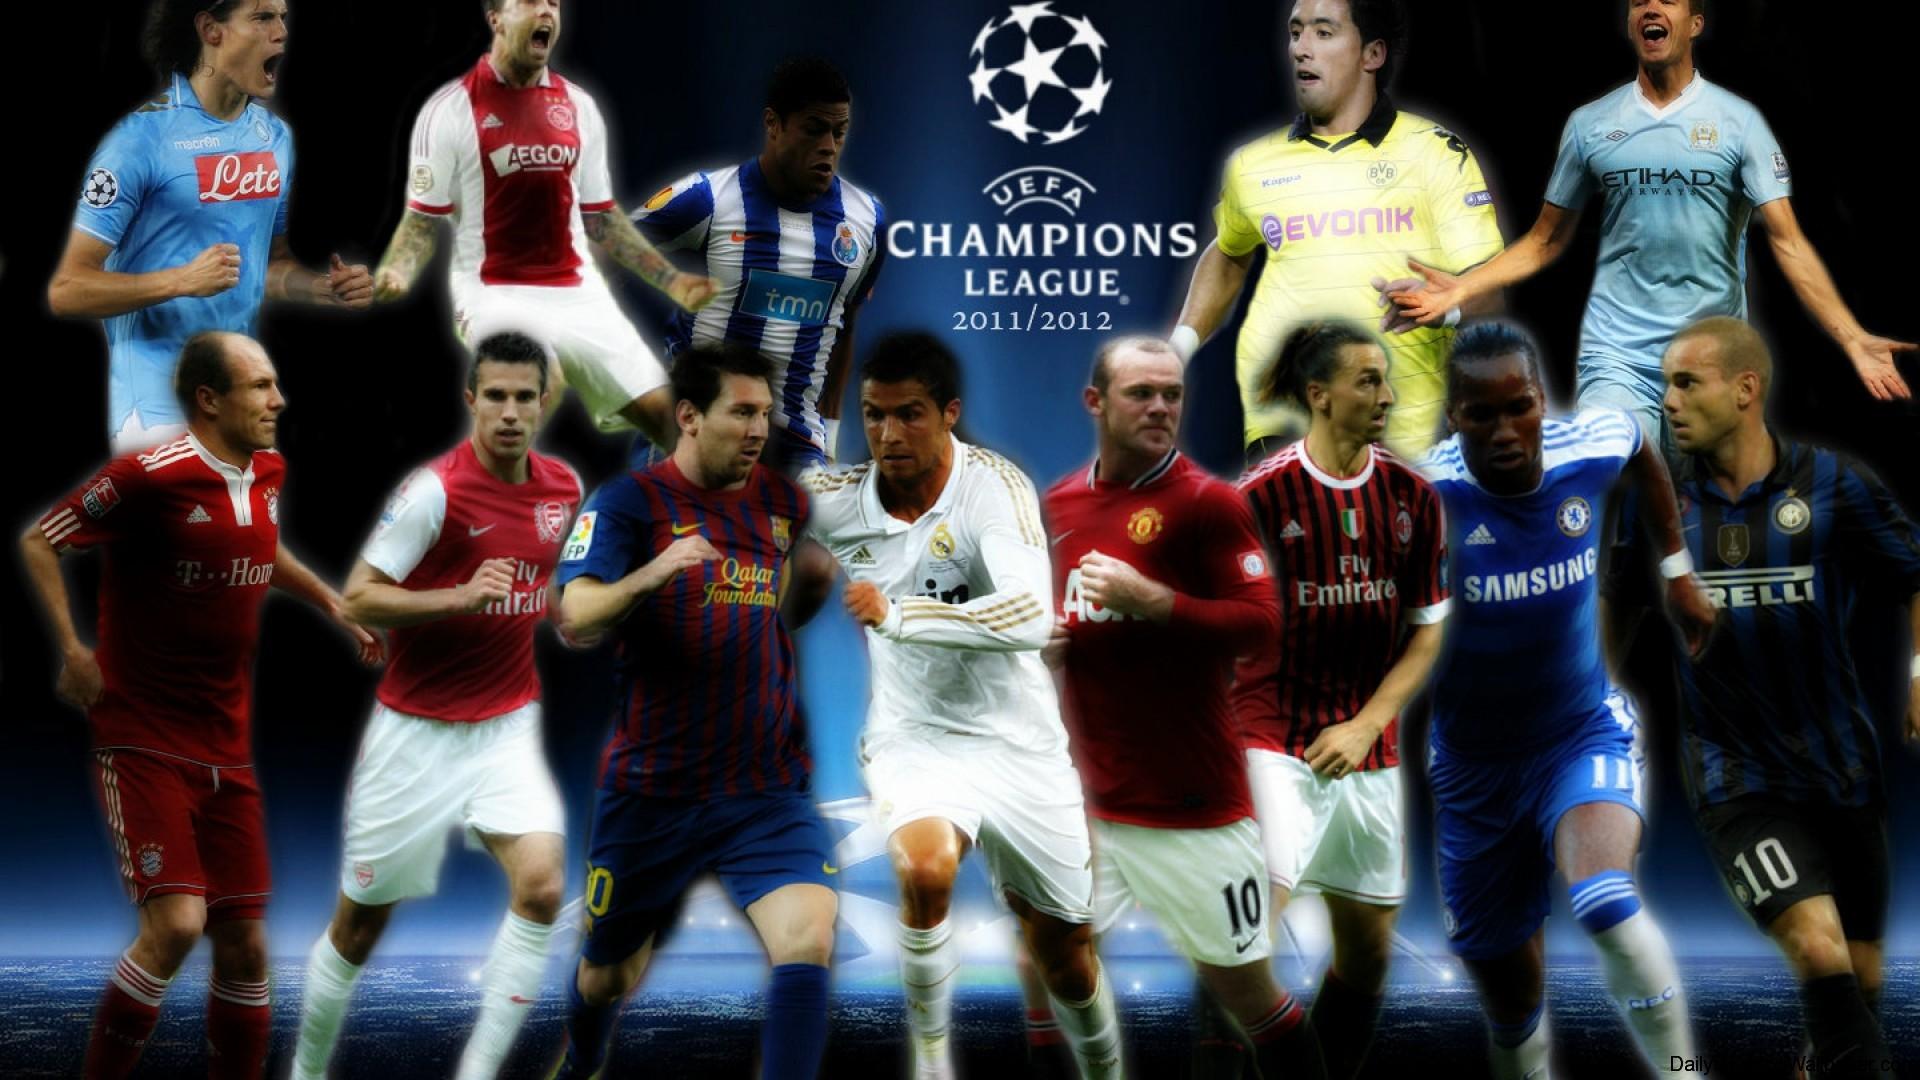 Free Download Desktop Wallpaper Hd For Windows 7 Champions League Wallpaper Hd Wallpapers